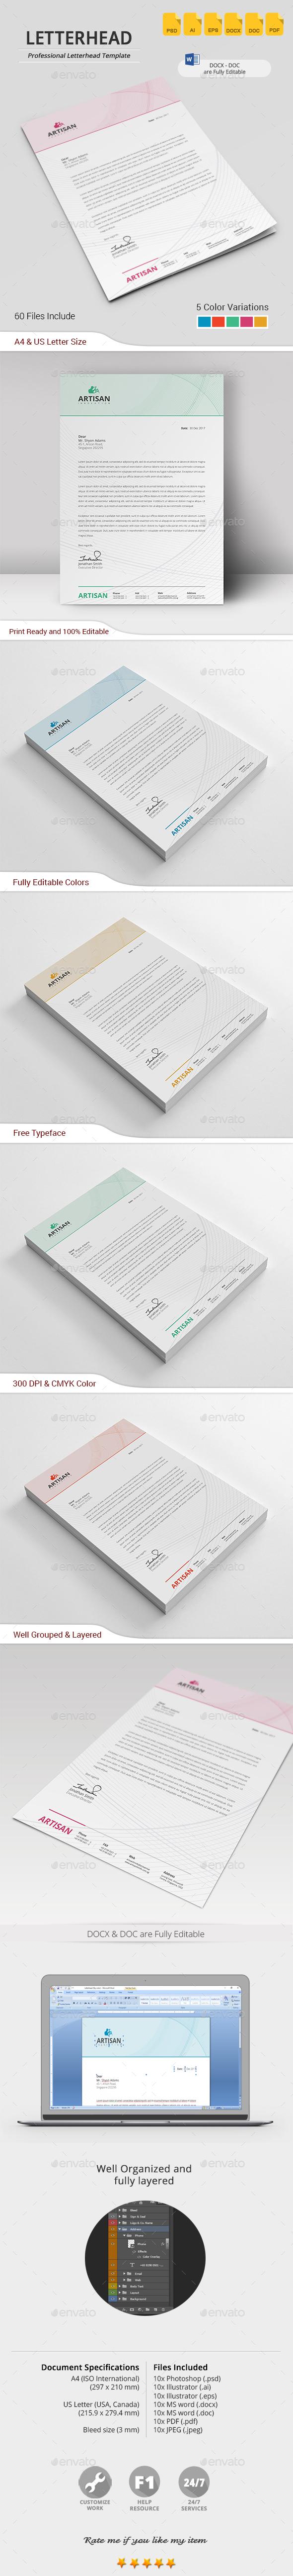 Letterhead — Photoshop PSD #template #paper • Download ➝ https ...